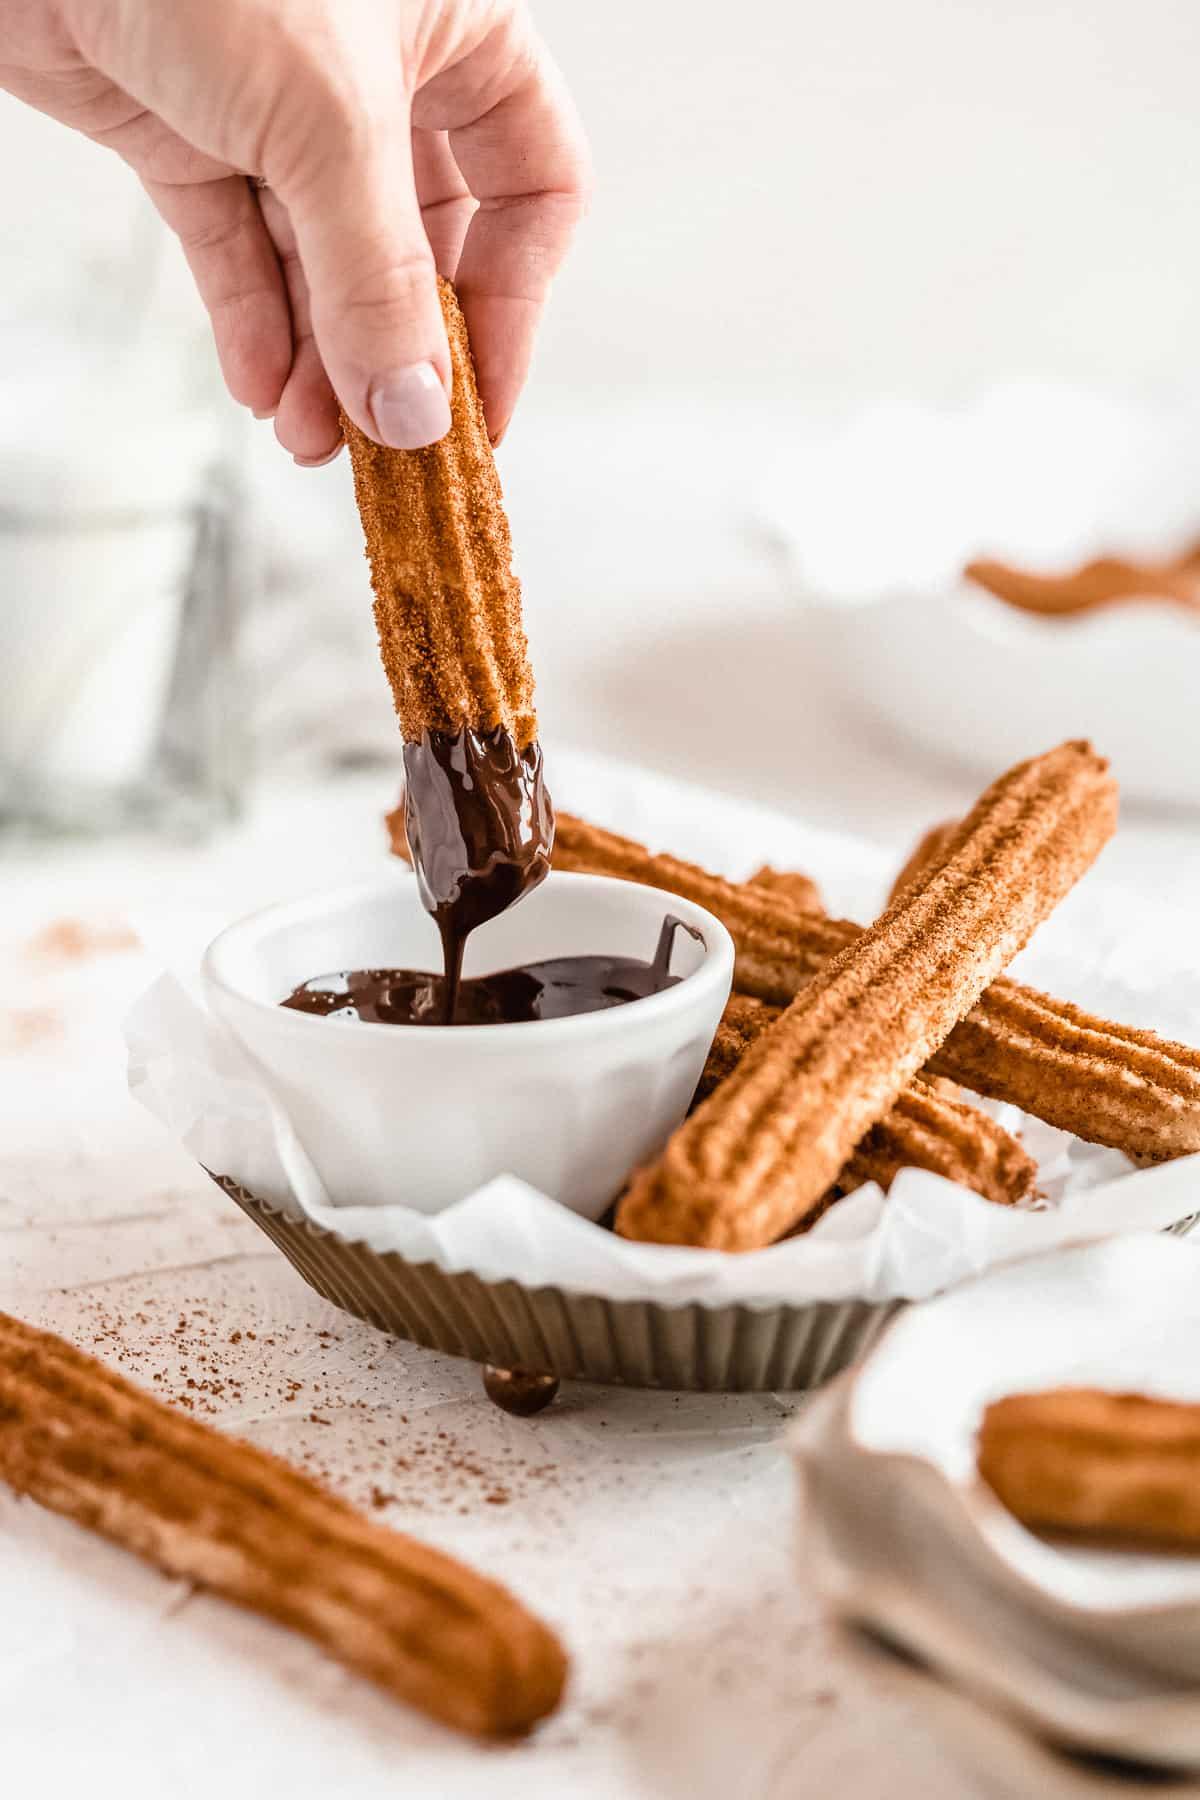 Hand dipping vegan churro into chocolate.